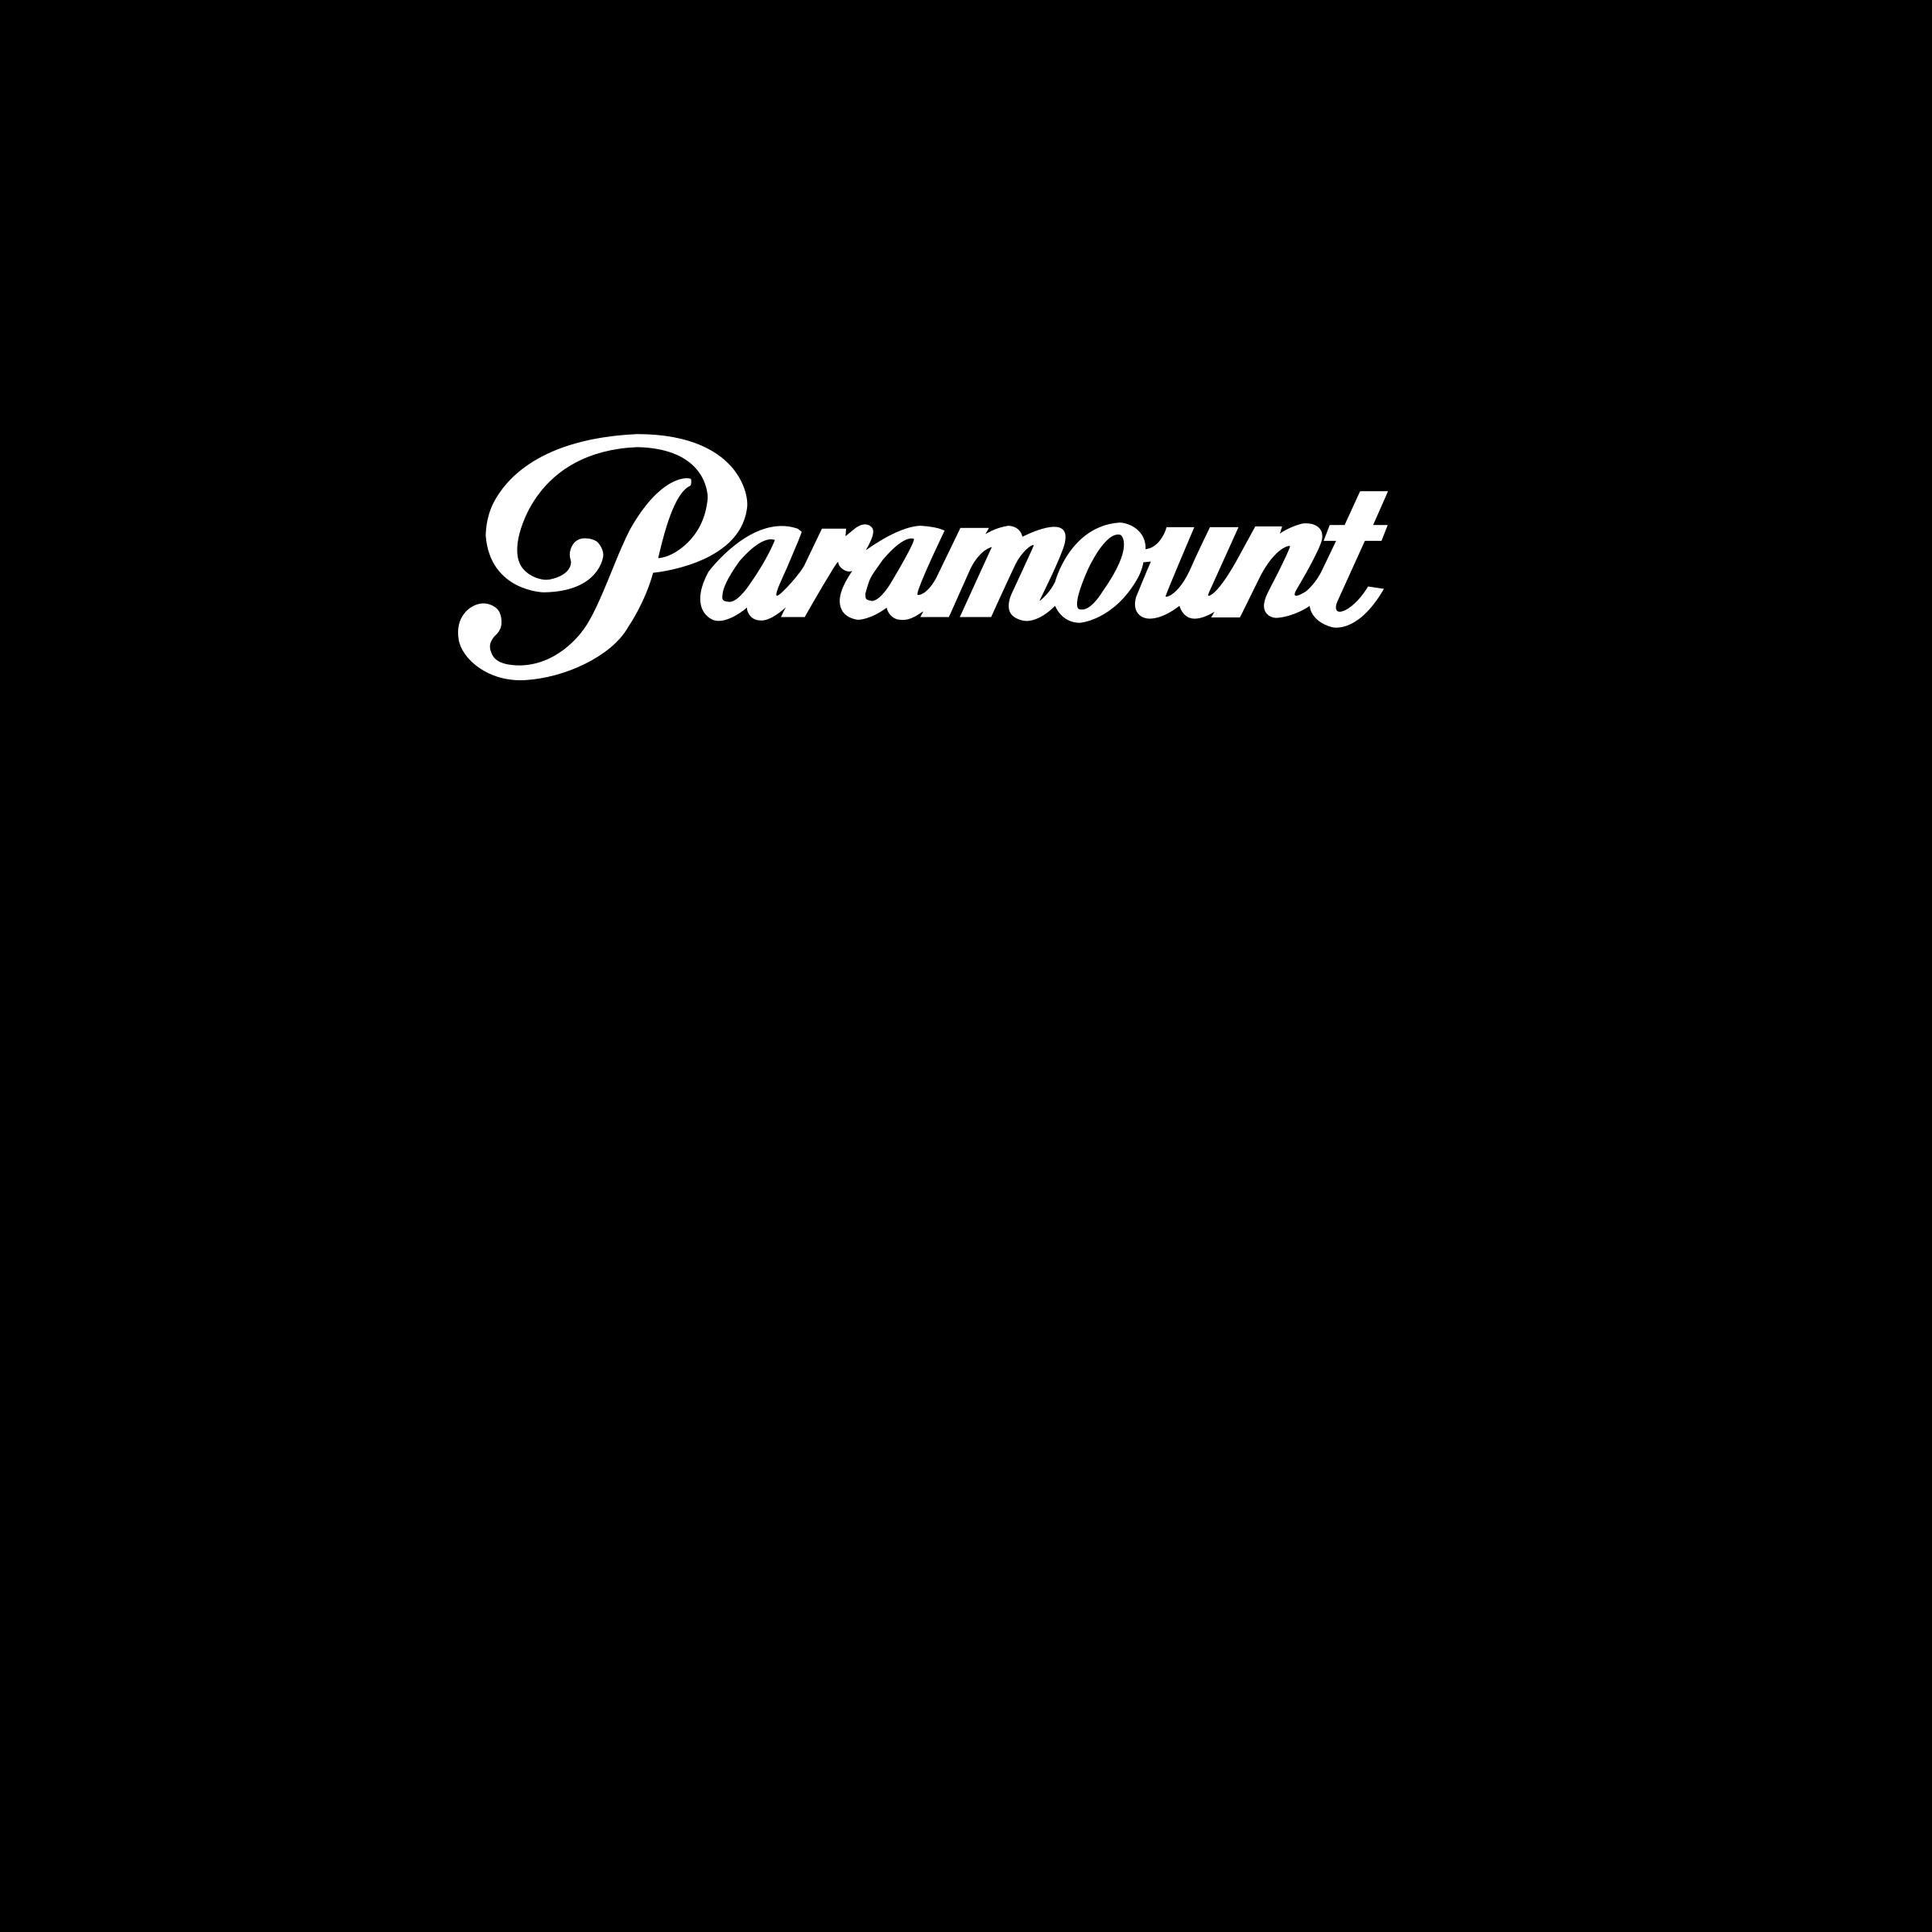 Paramount Pictures Logo PNG Transparent  for Paramount Logo Png  183qdu